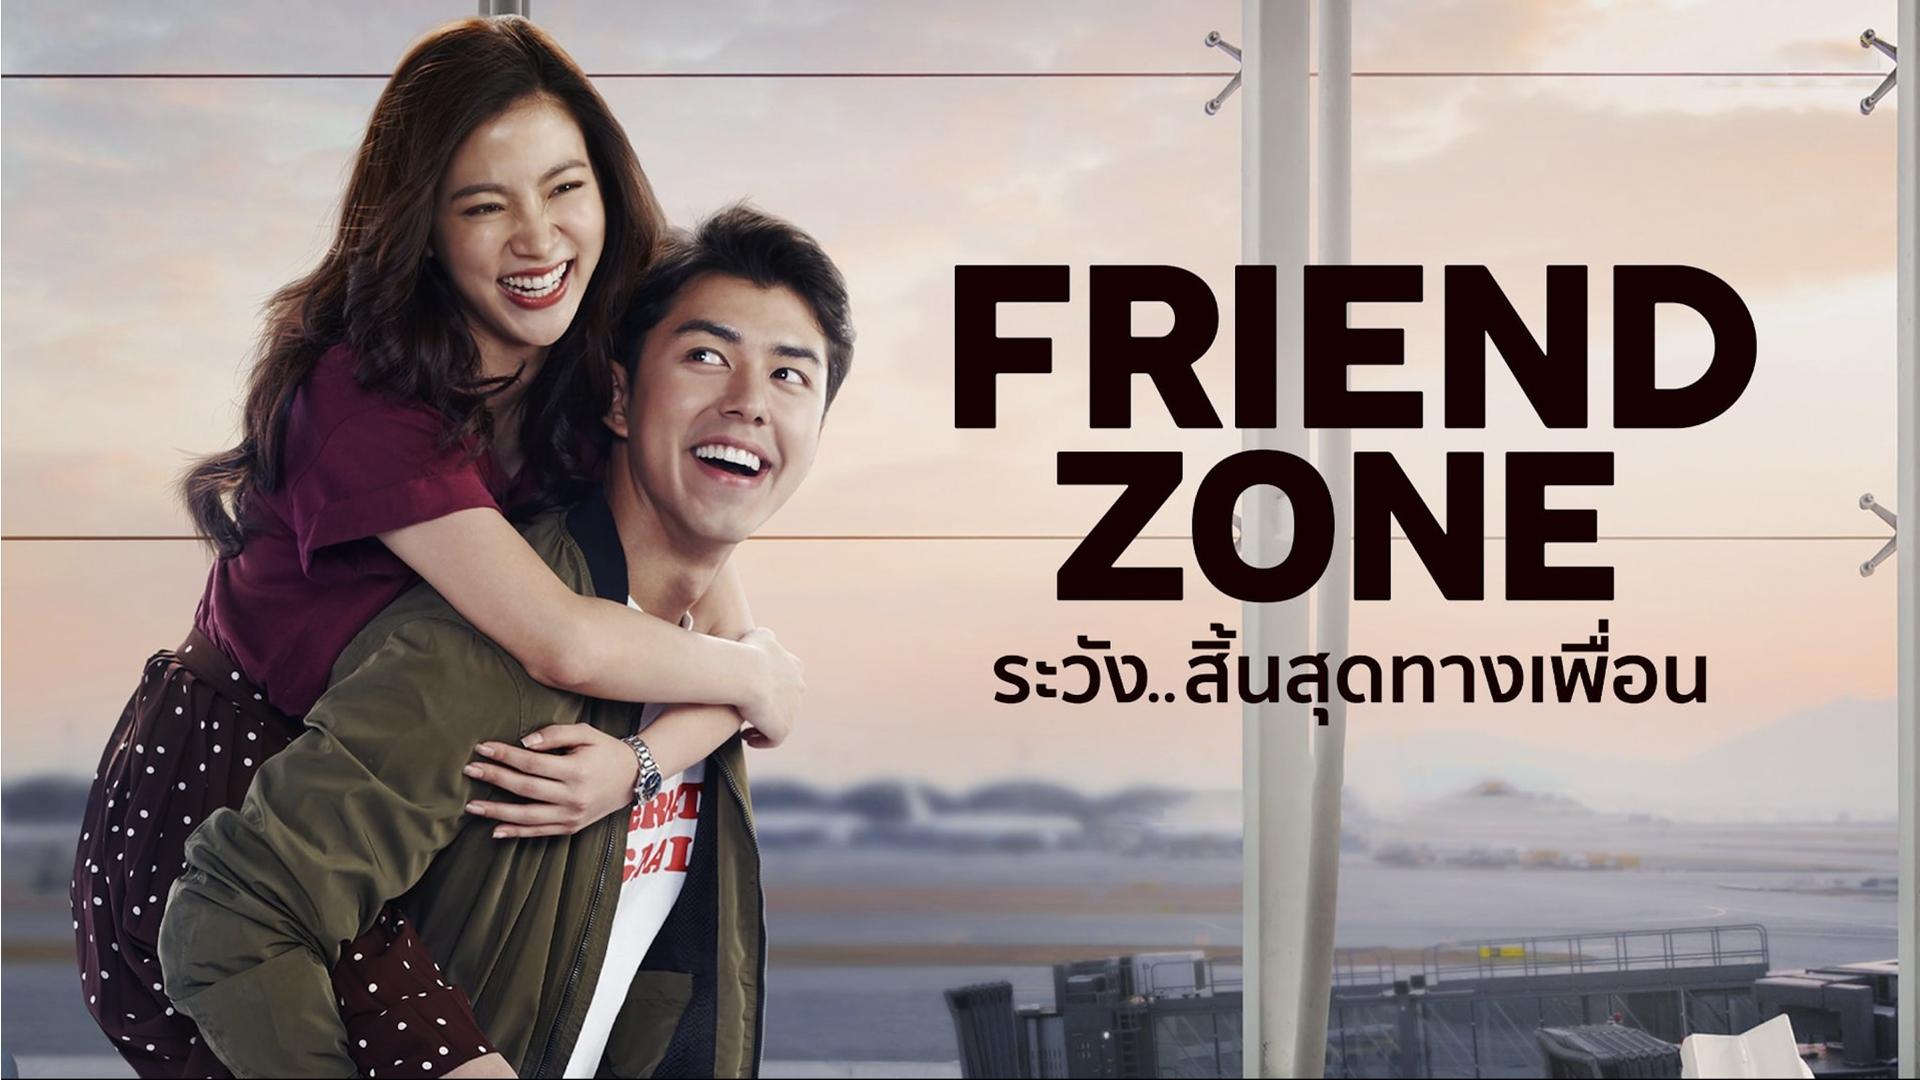 Friend Zone on Amazon Prime Video UK